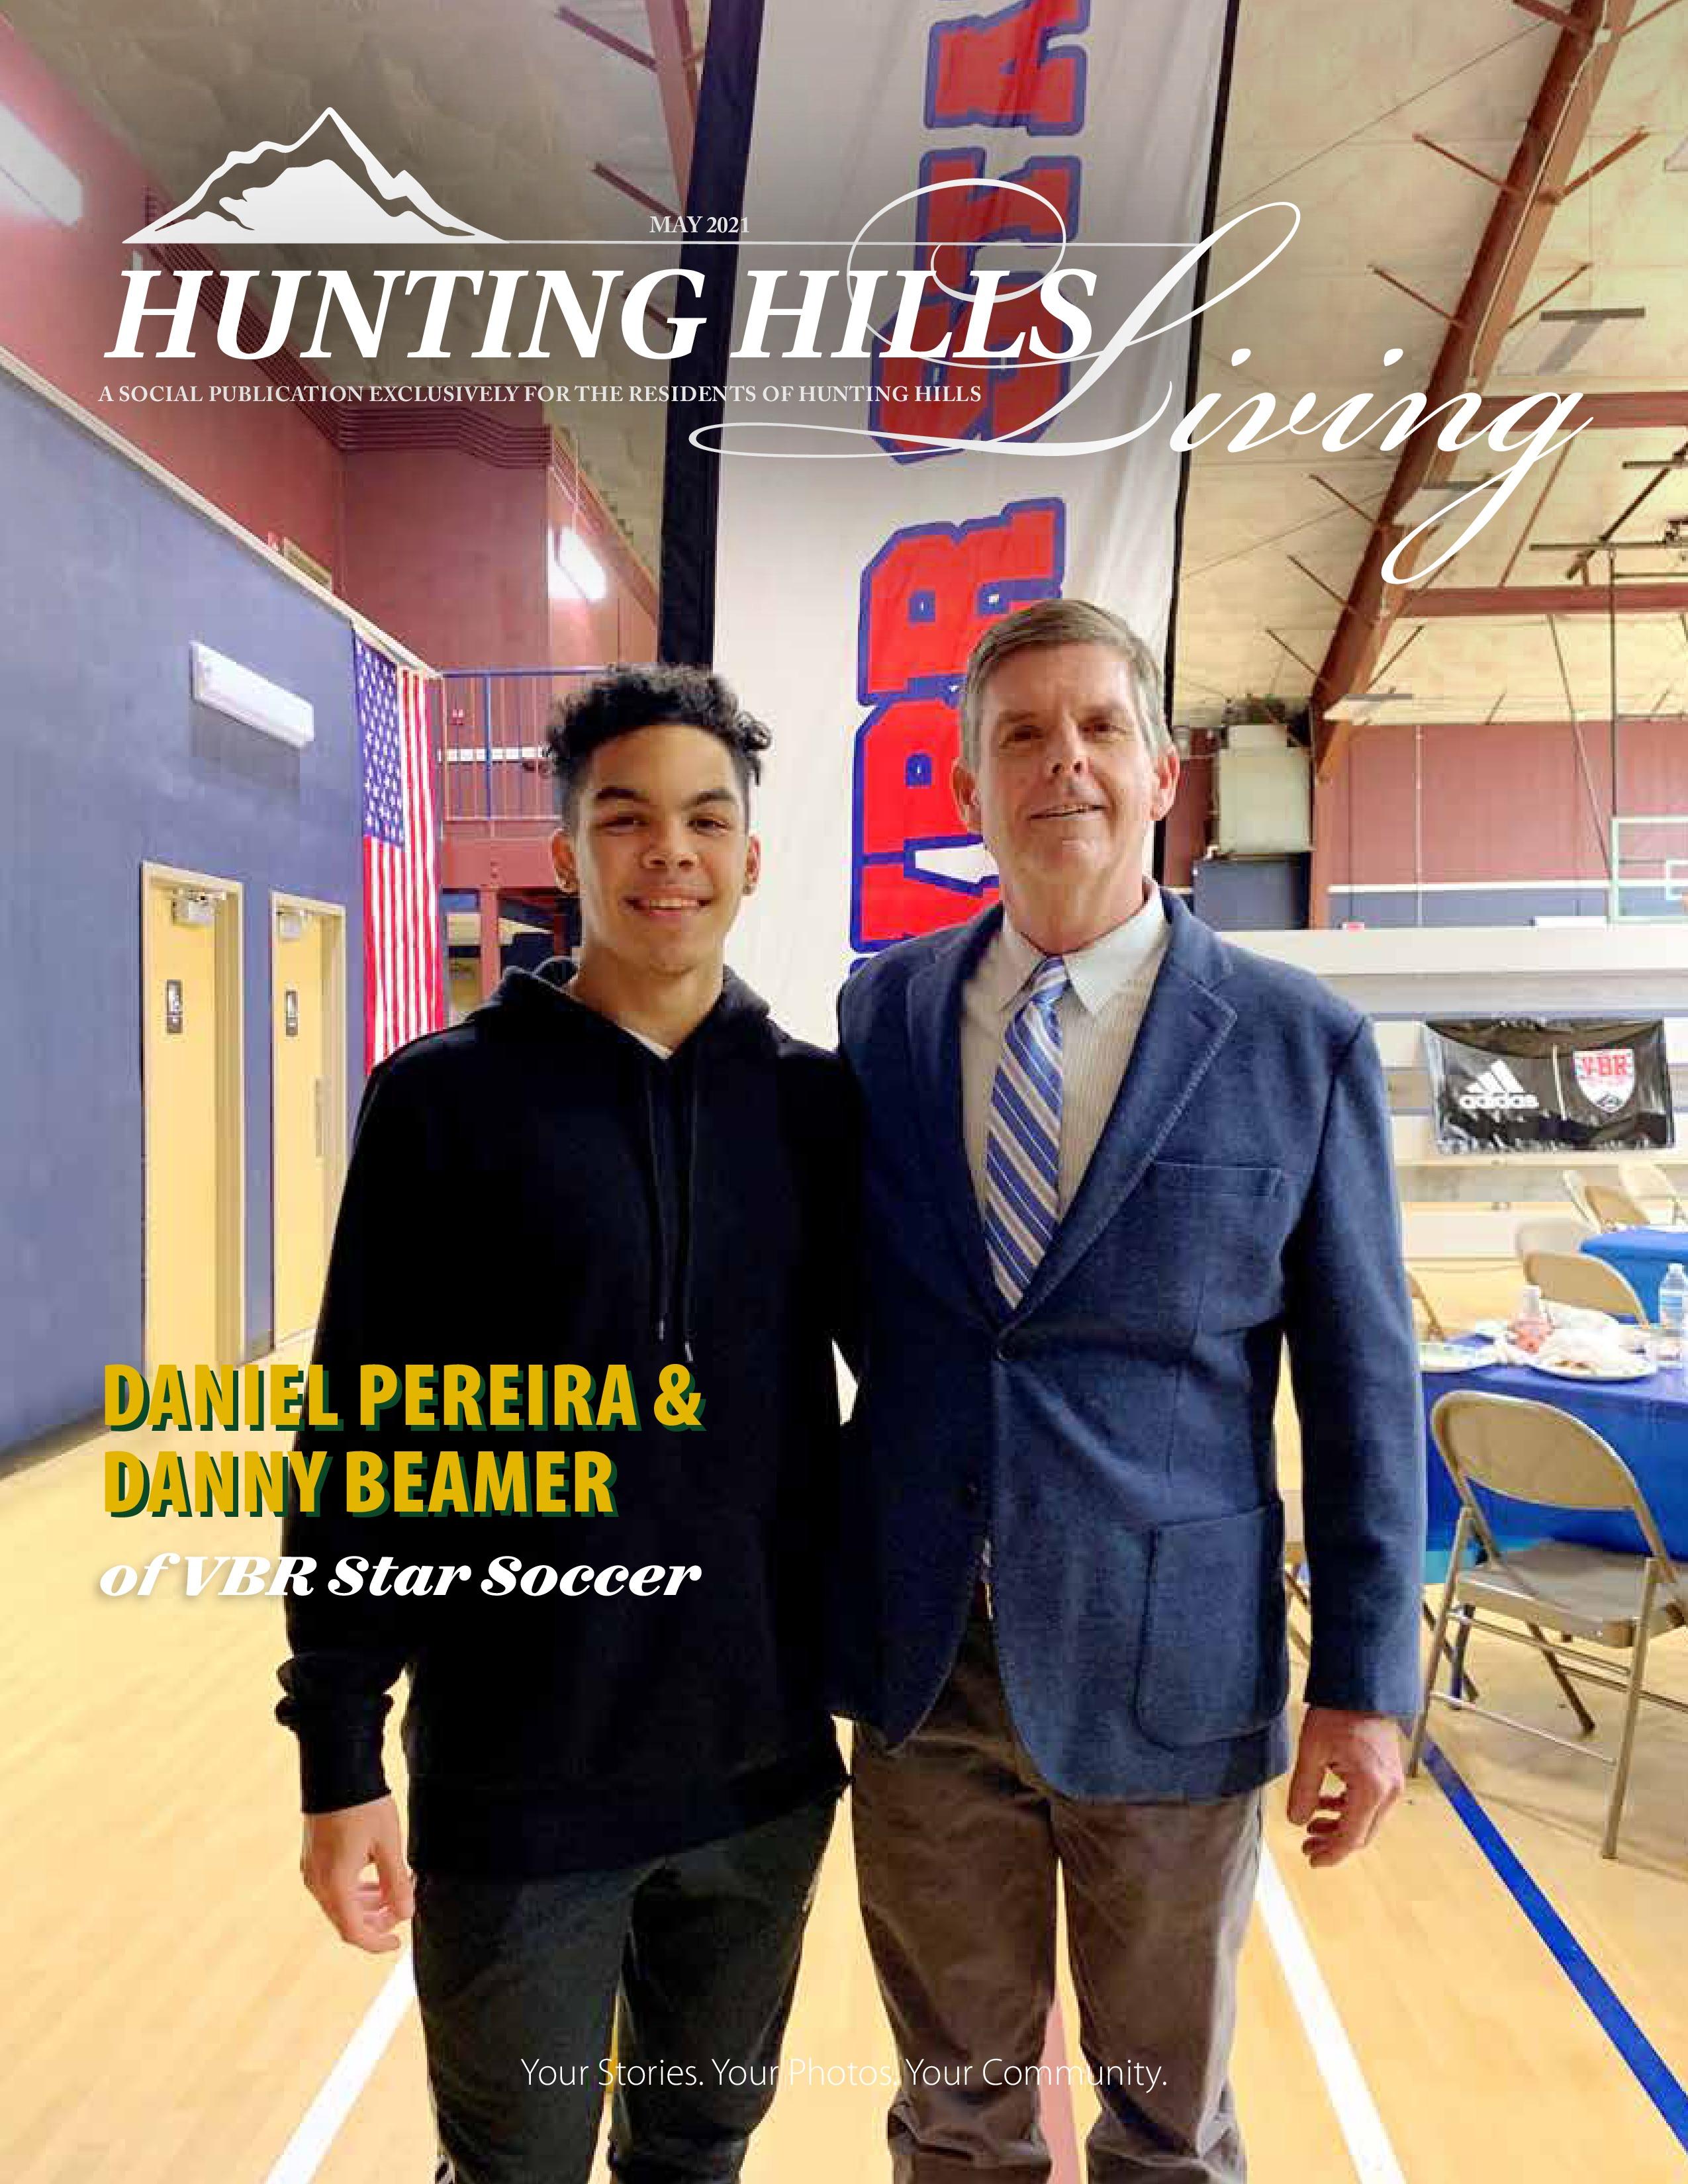 Hunting Hills Living 2021-05-01